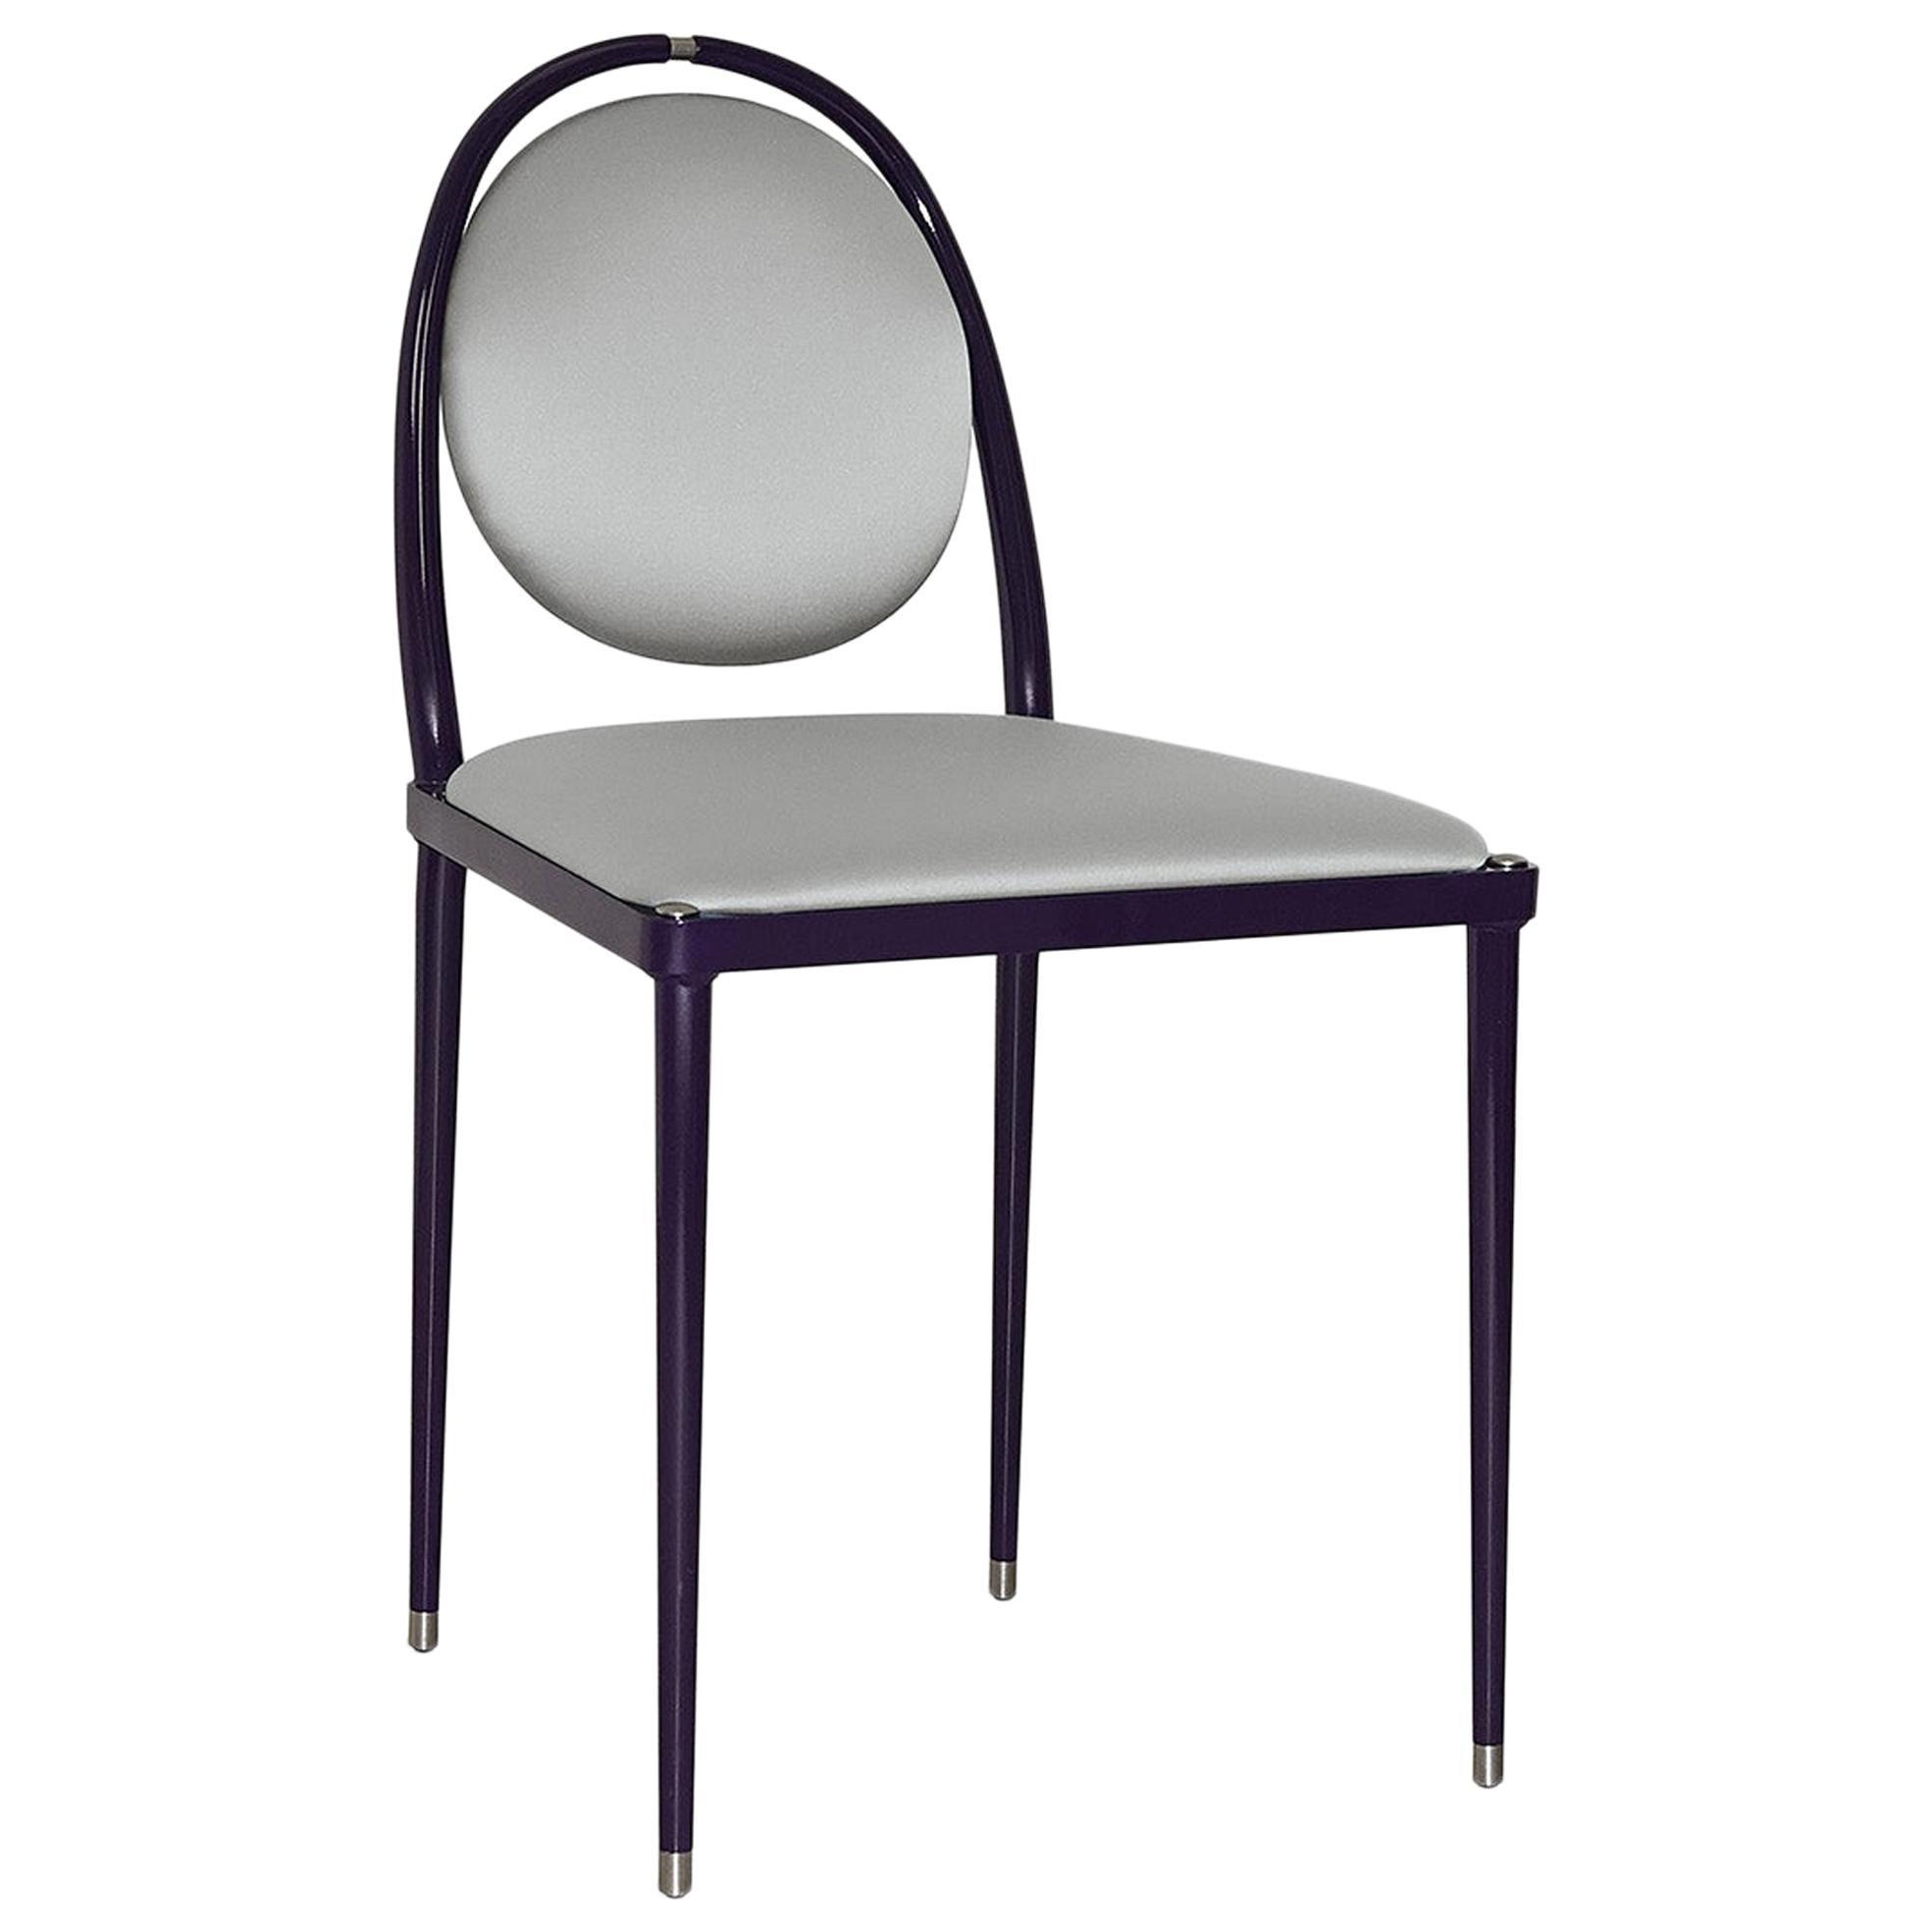 'Balzaretti' Chair in Silver Silk